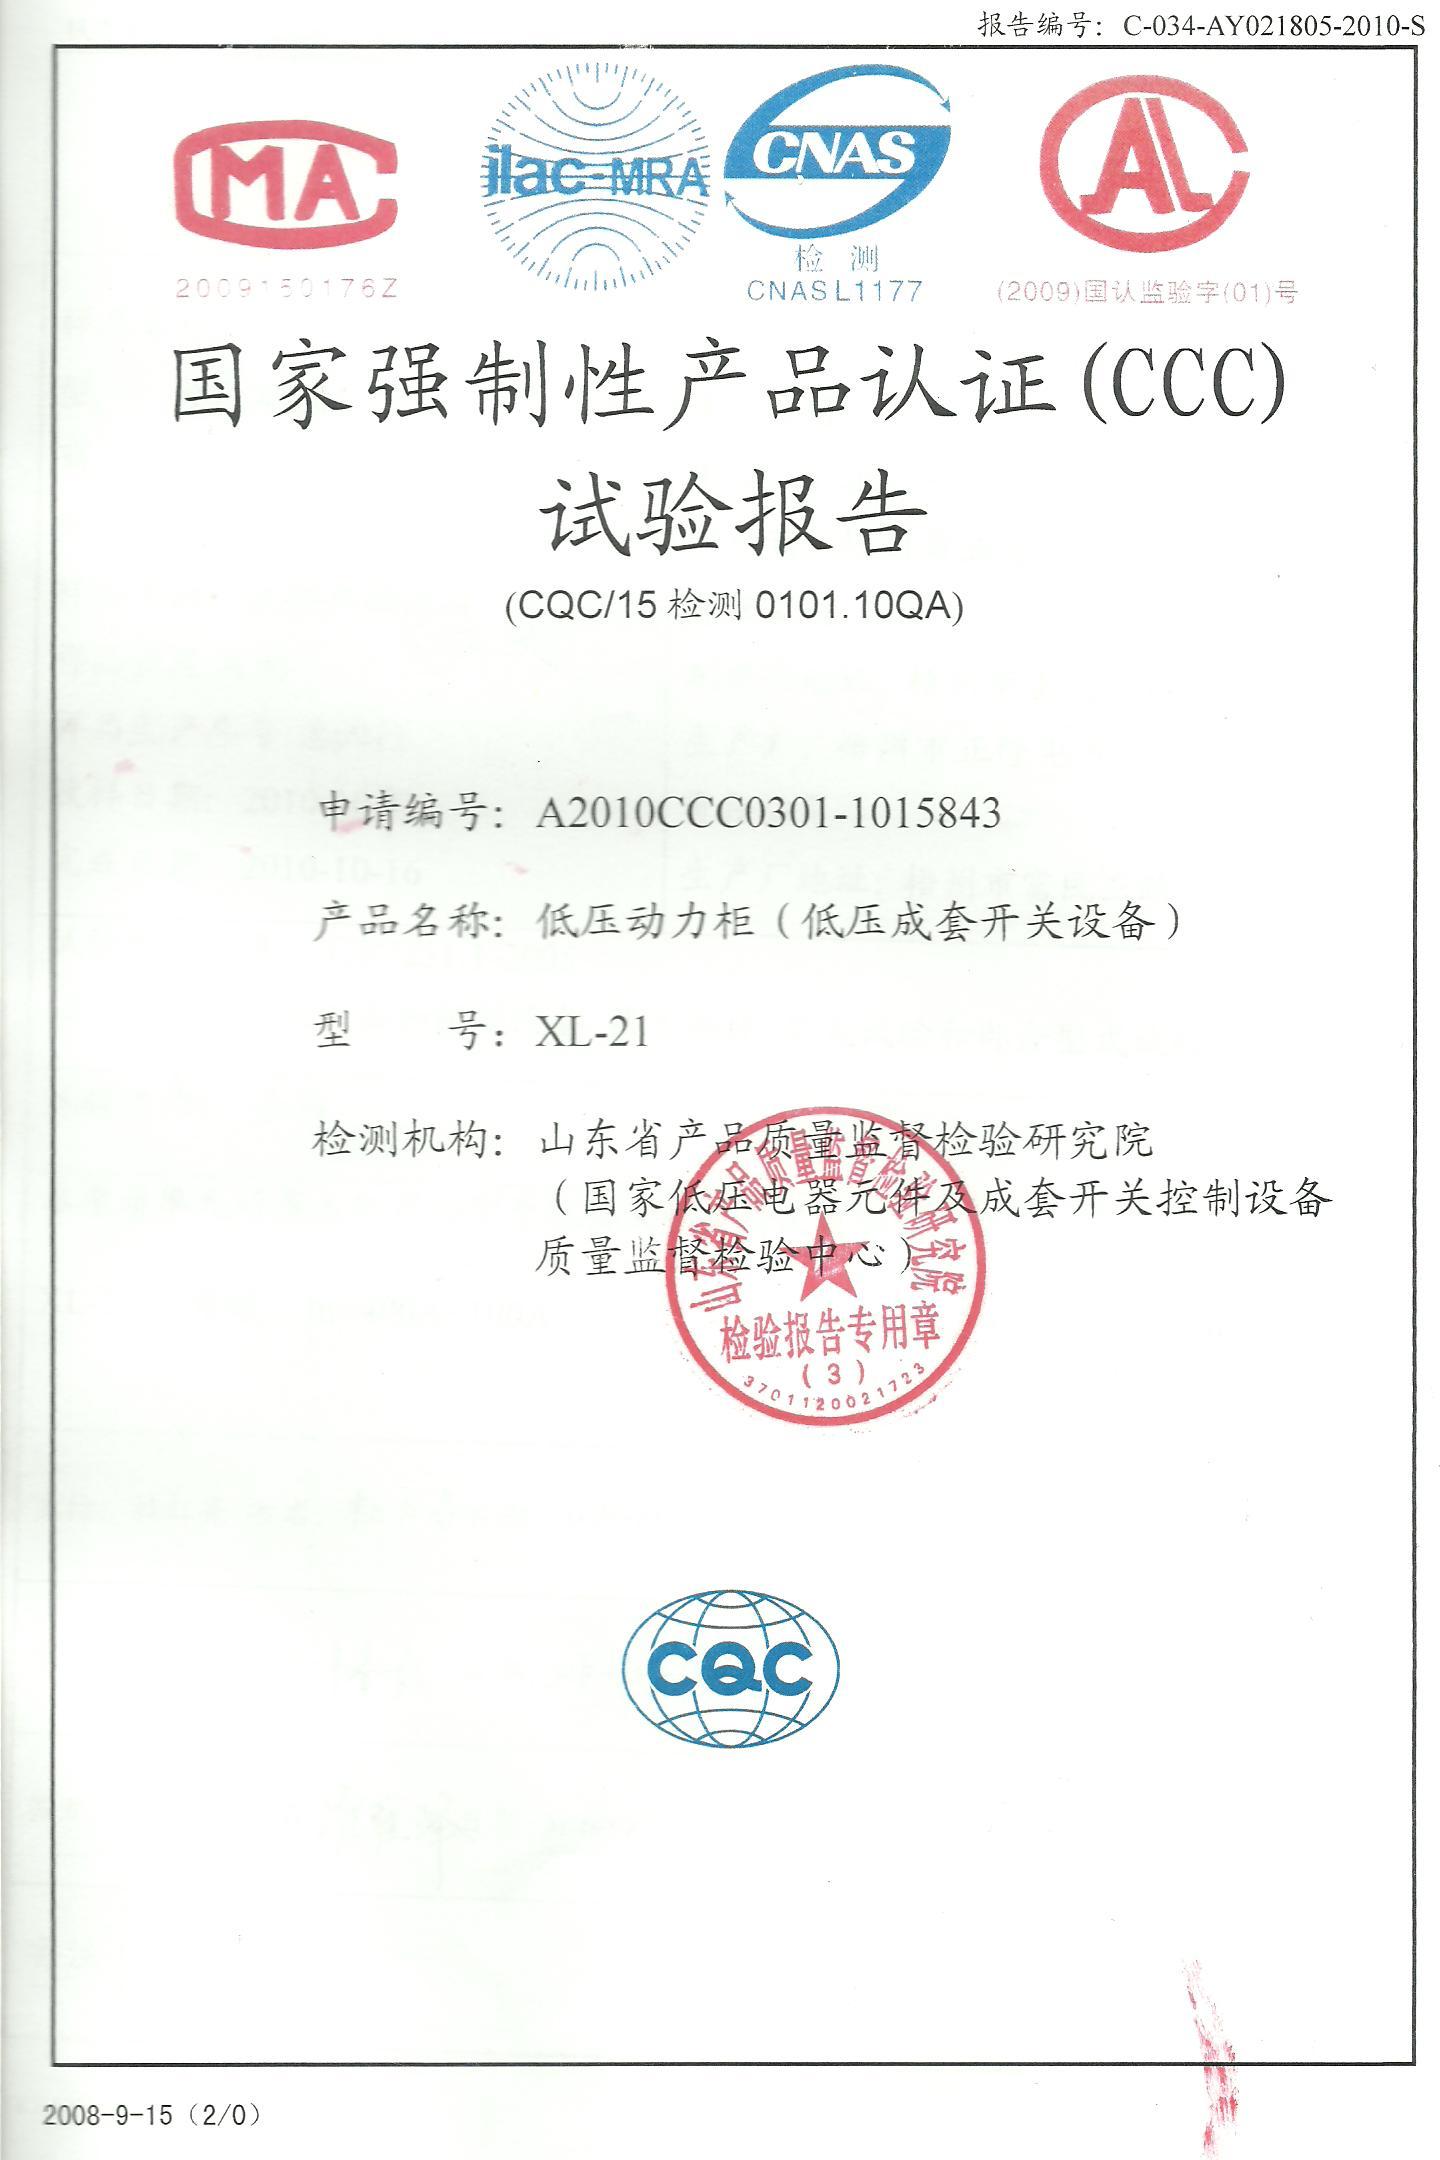 3c认证证书矢量图